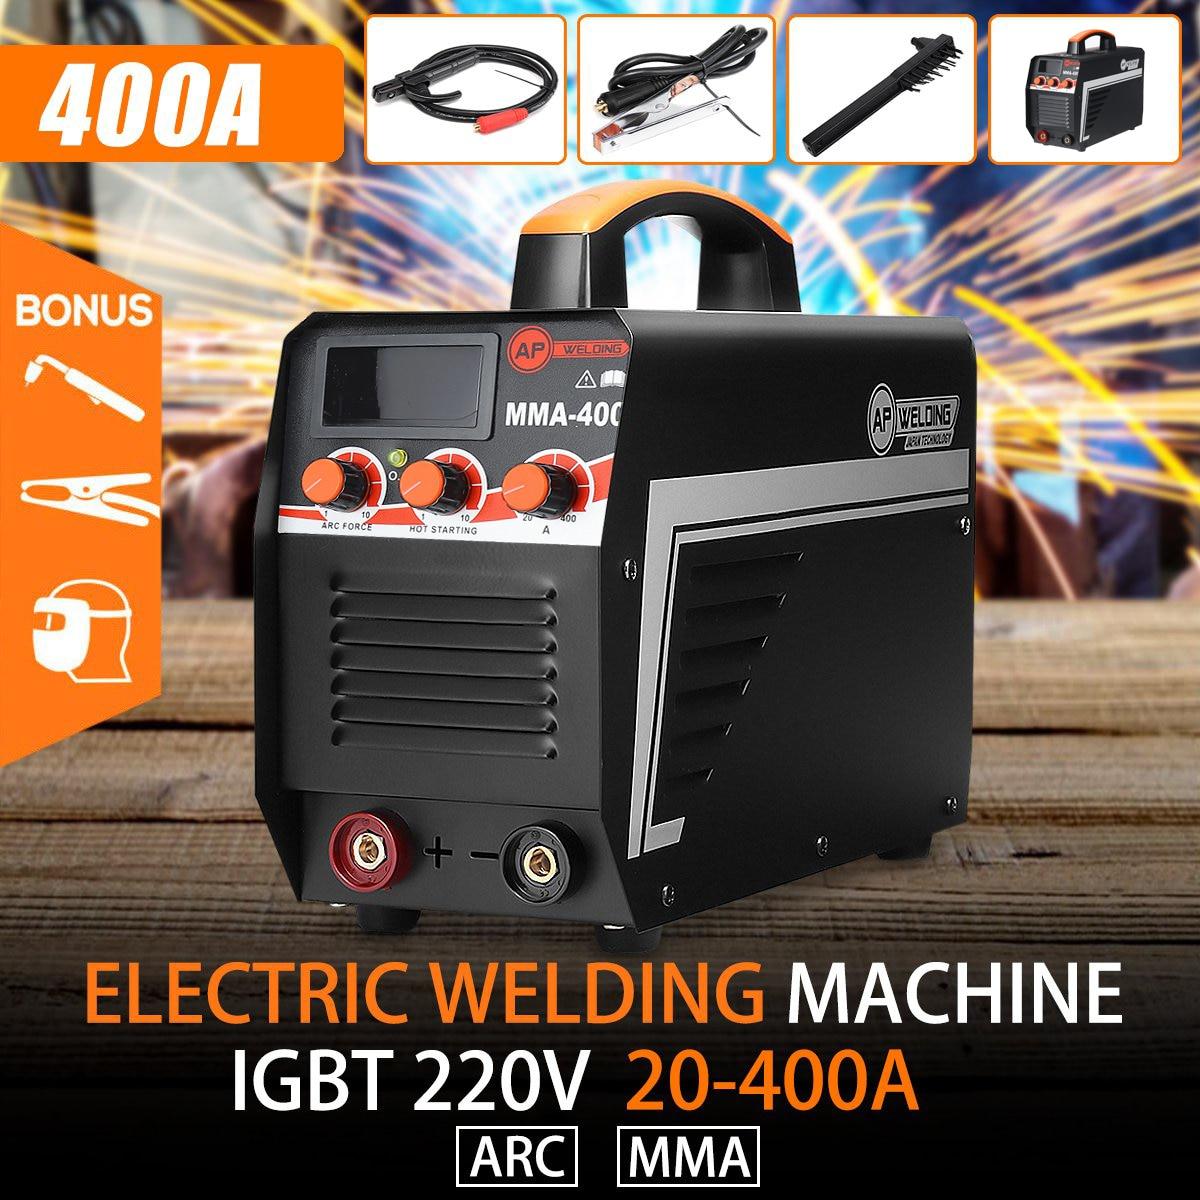 DIY 220V IGBT Digital Welding Working Arc MMA Stick Home Welding For Welders Machine 400 Arc Set New Inverter Display Electric